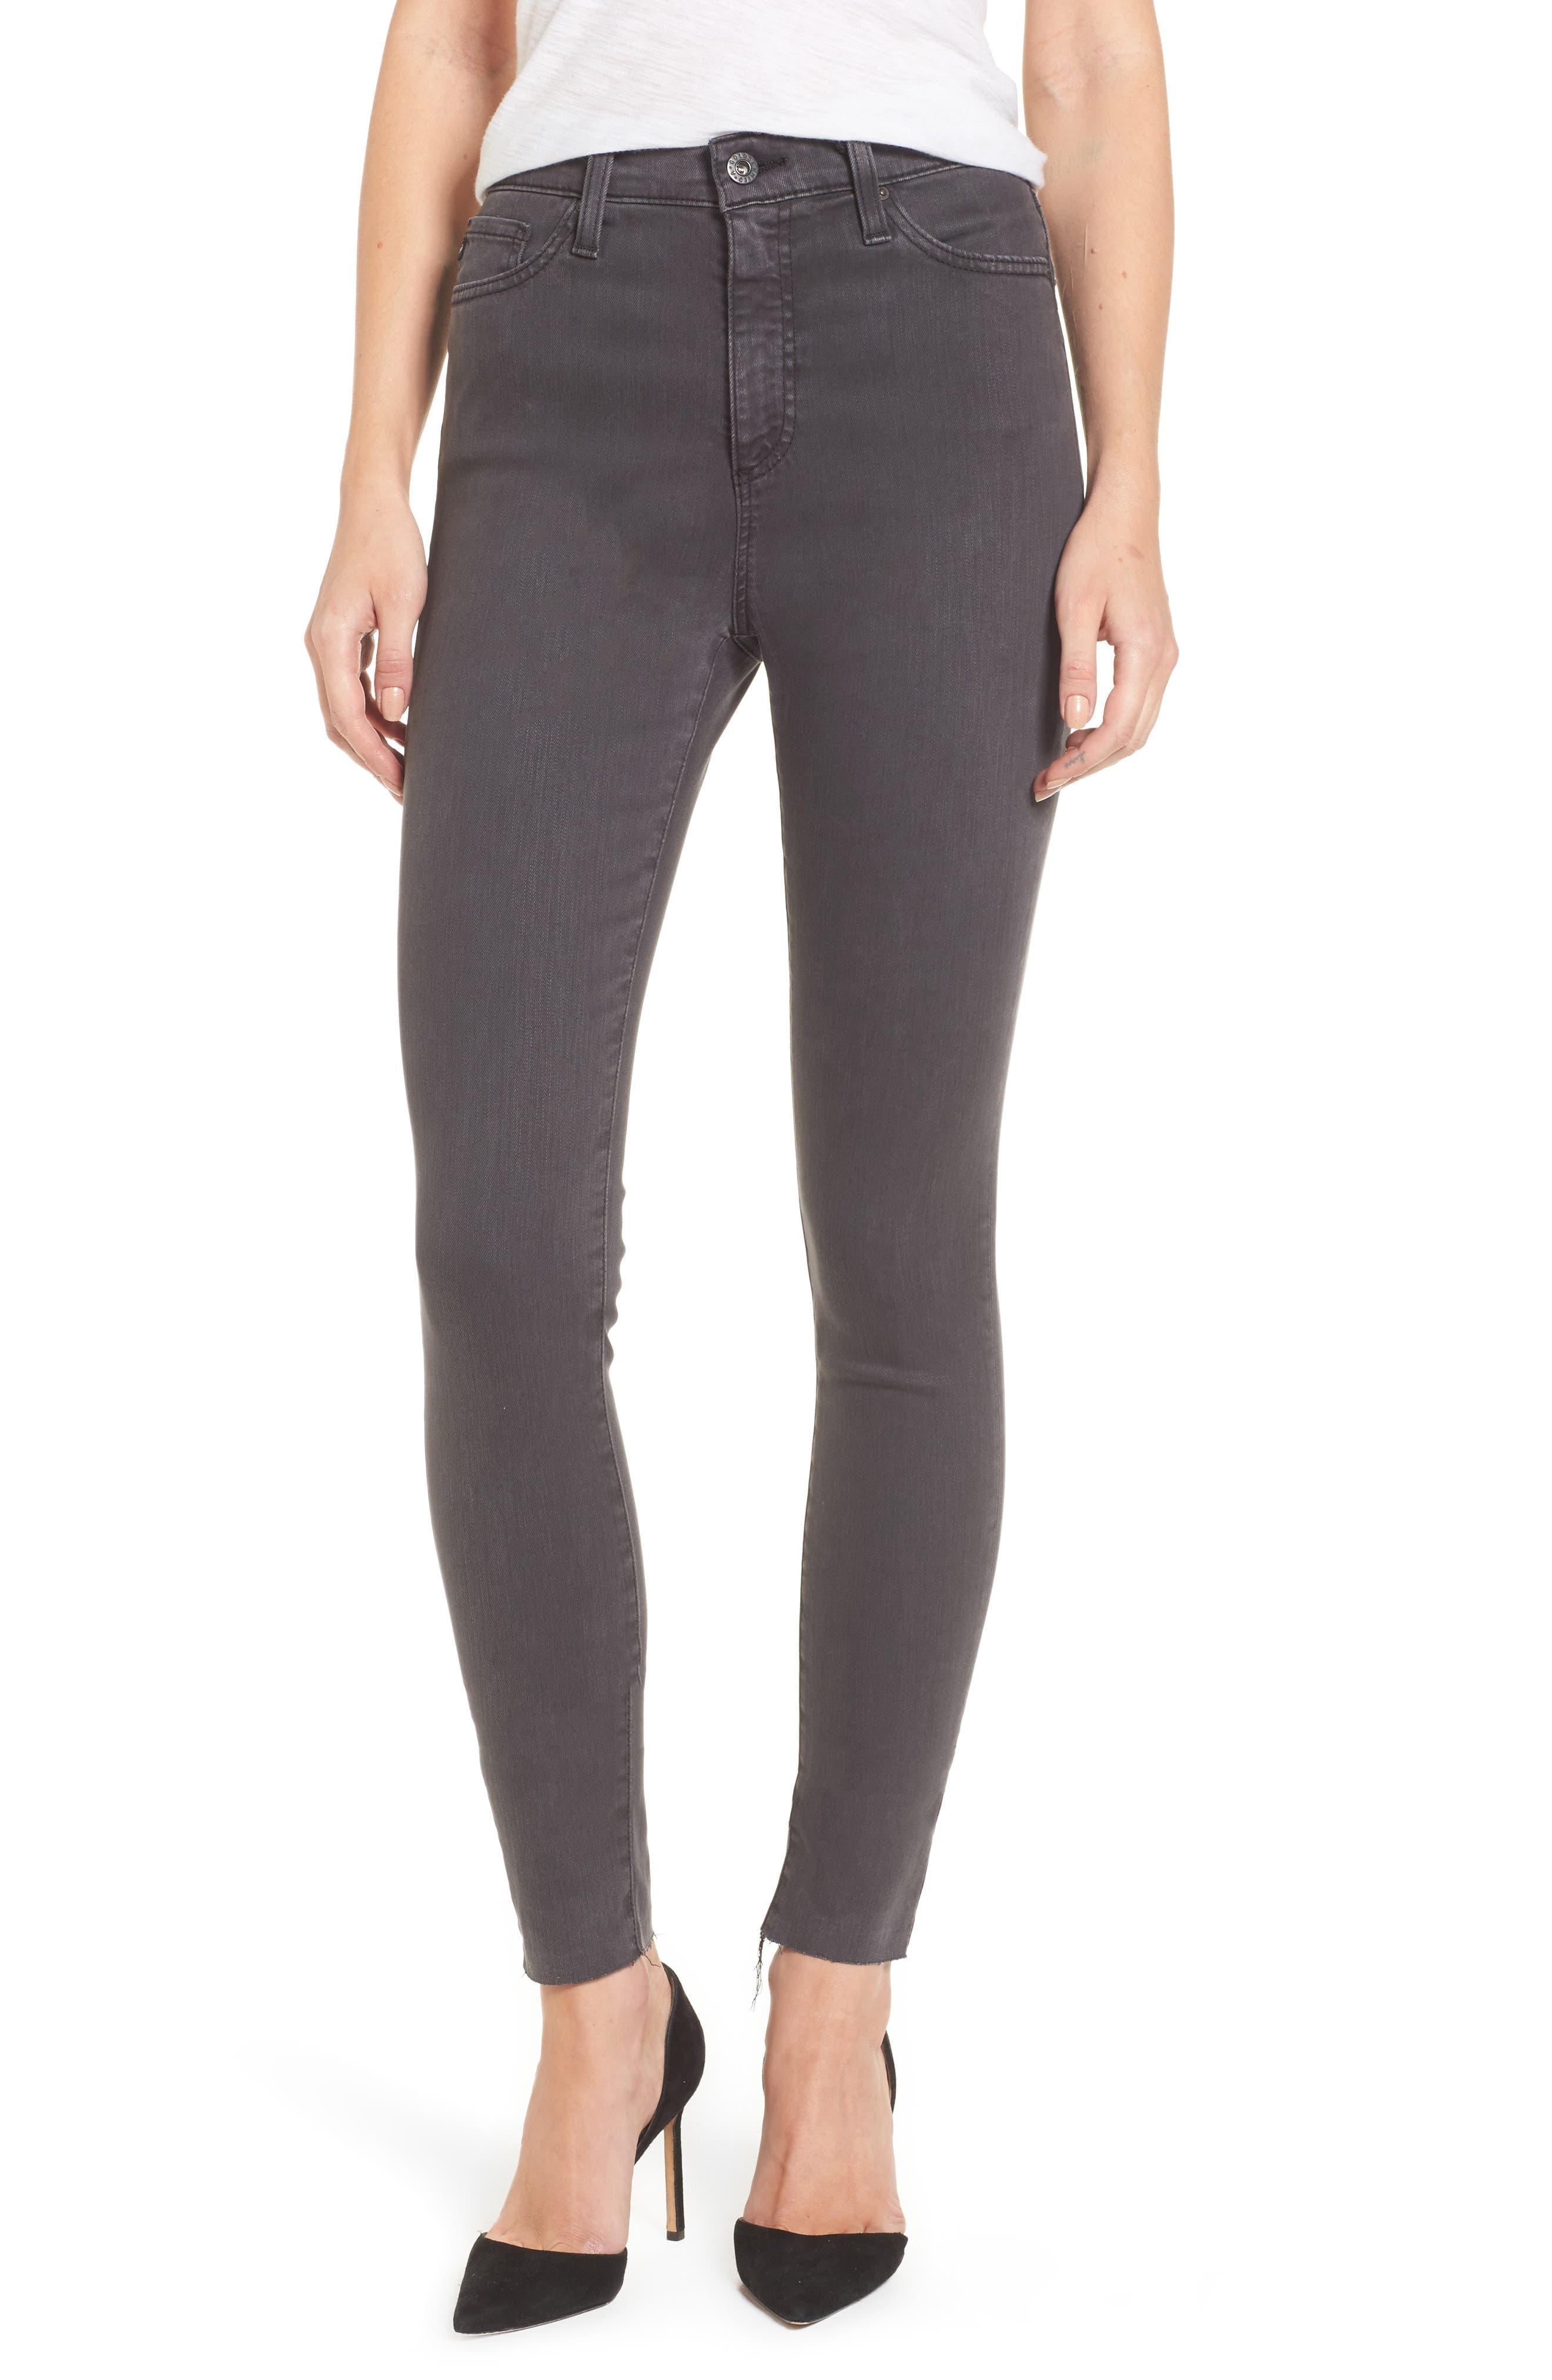 Mila High Rise Skinny Jeans,                         Main,                         color, Interstellar Black